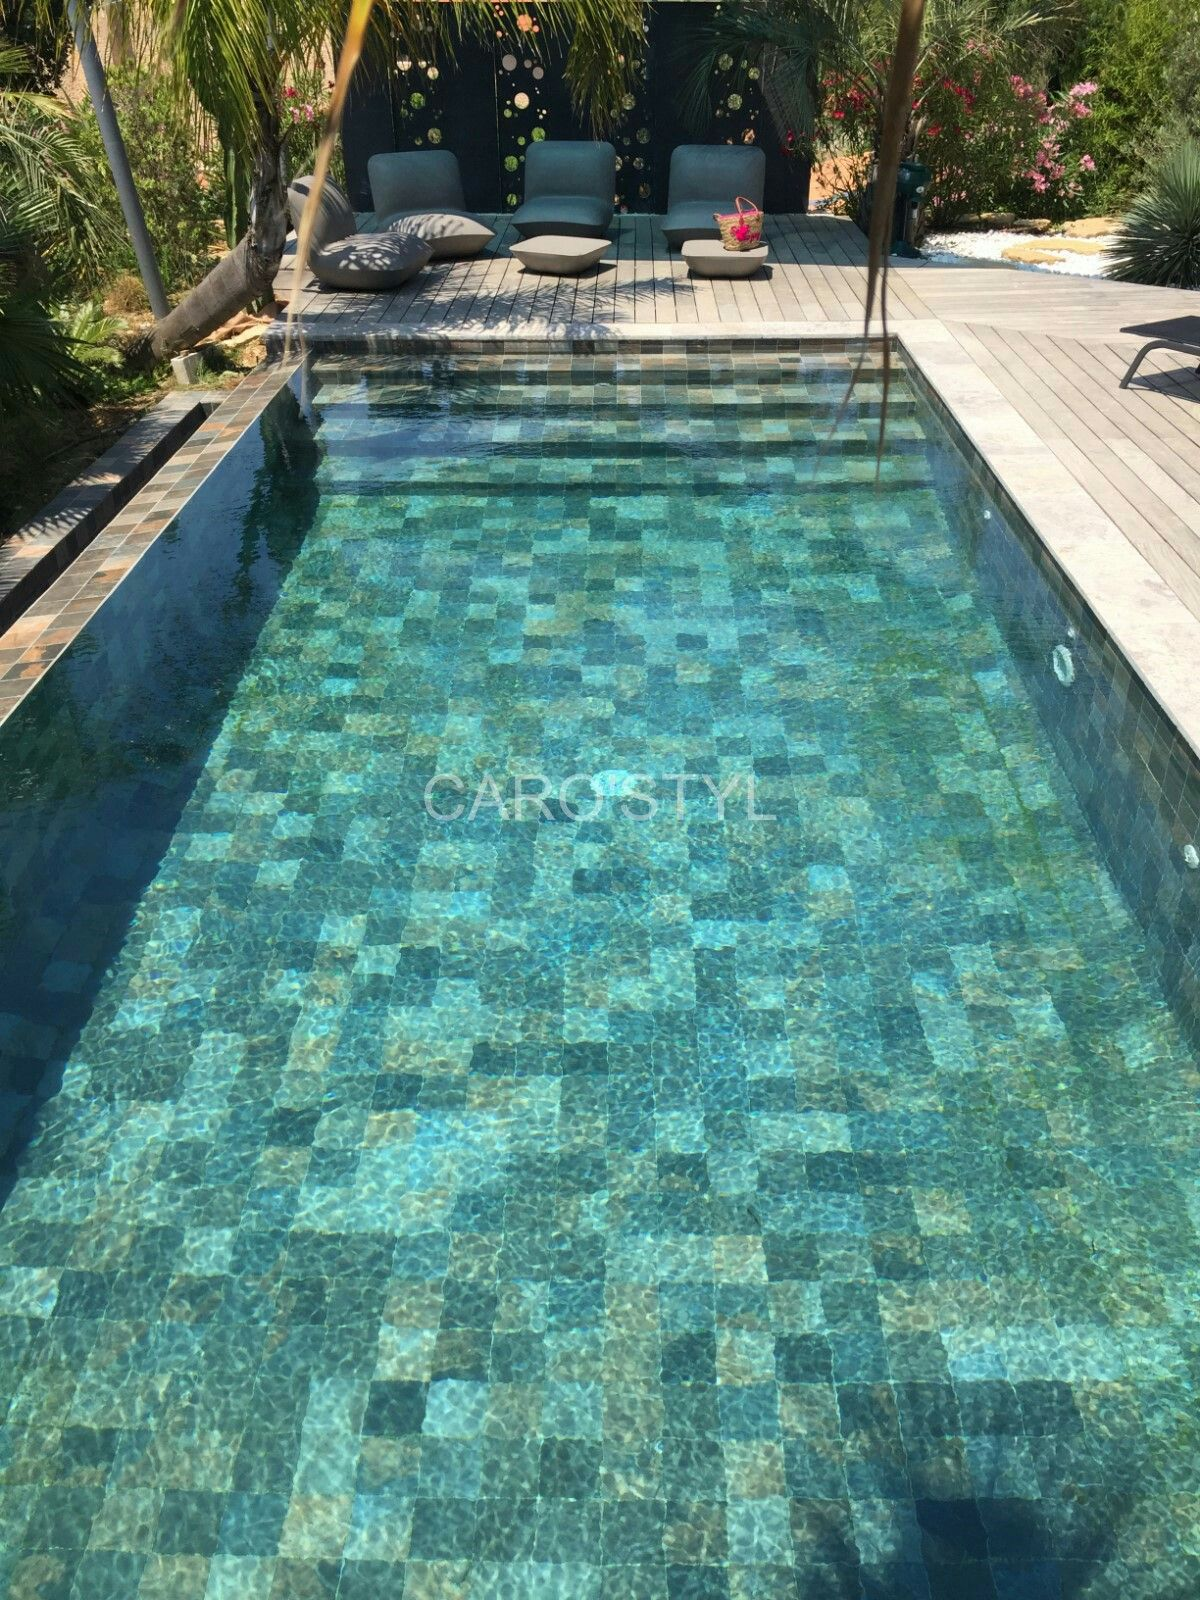 Pin By Youssef Elkouhene On Serenity Now Swimming Pool Tiles Swimming Pools Backyard Pool